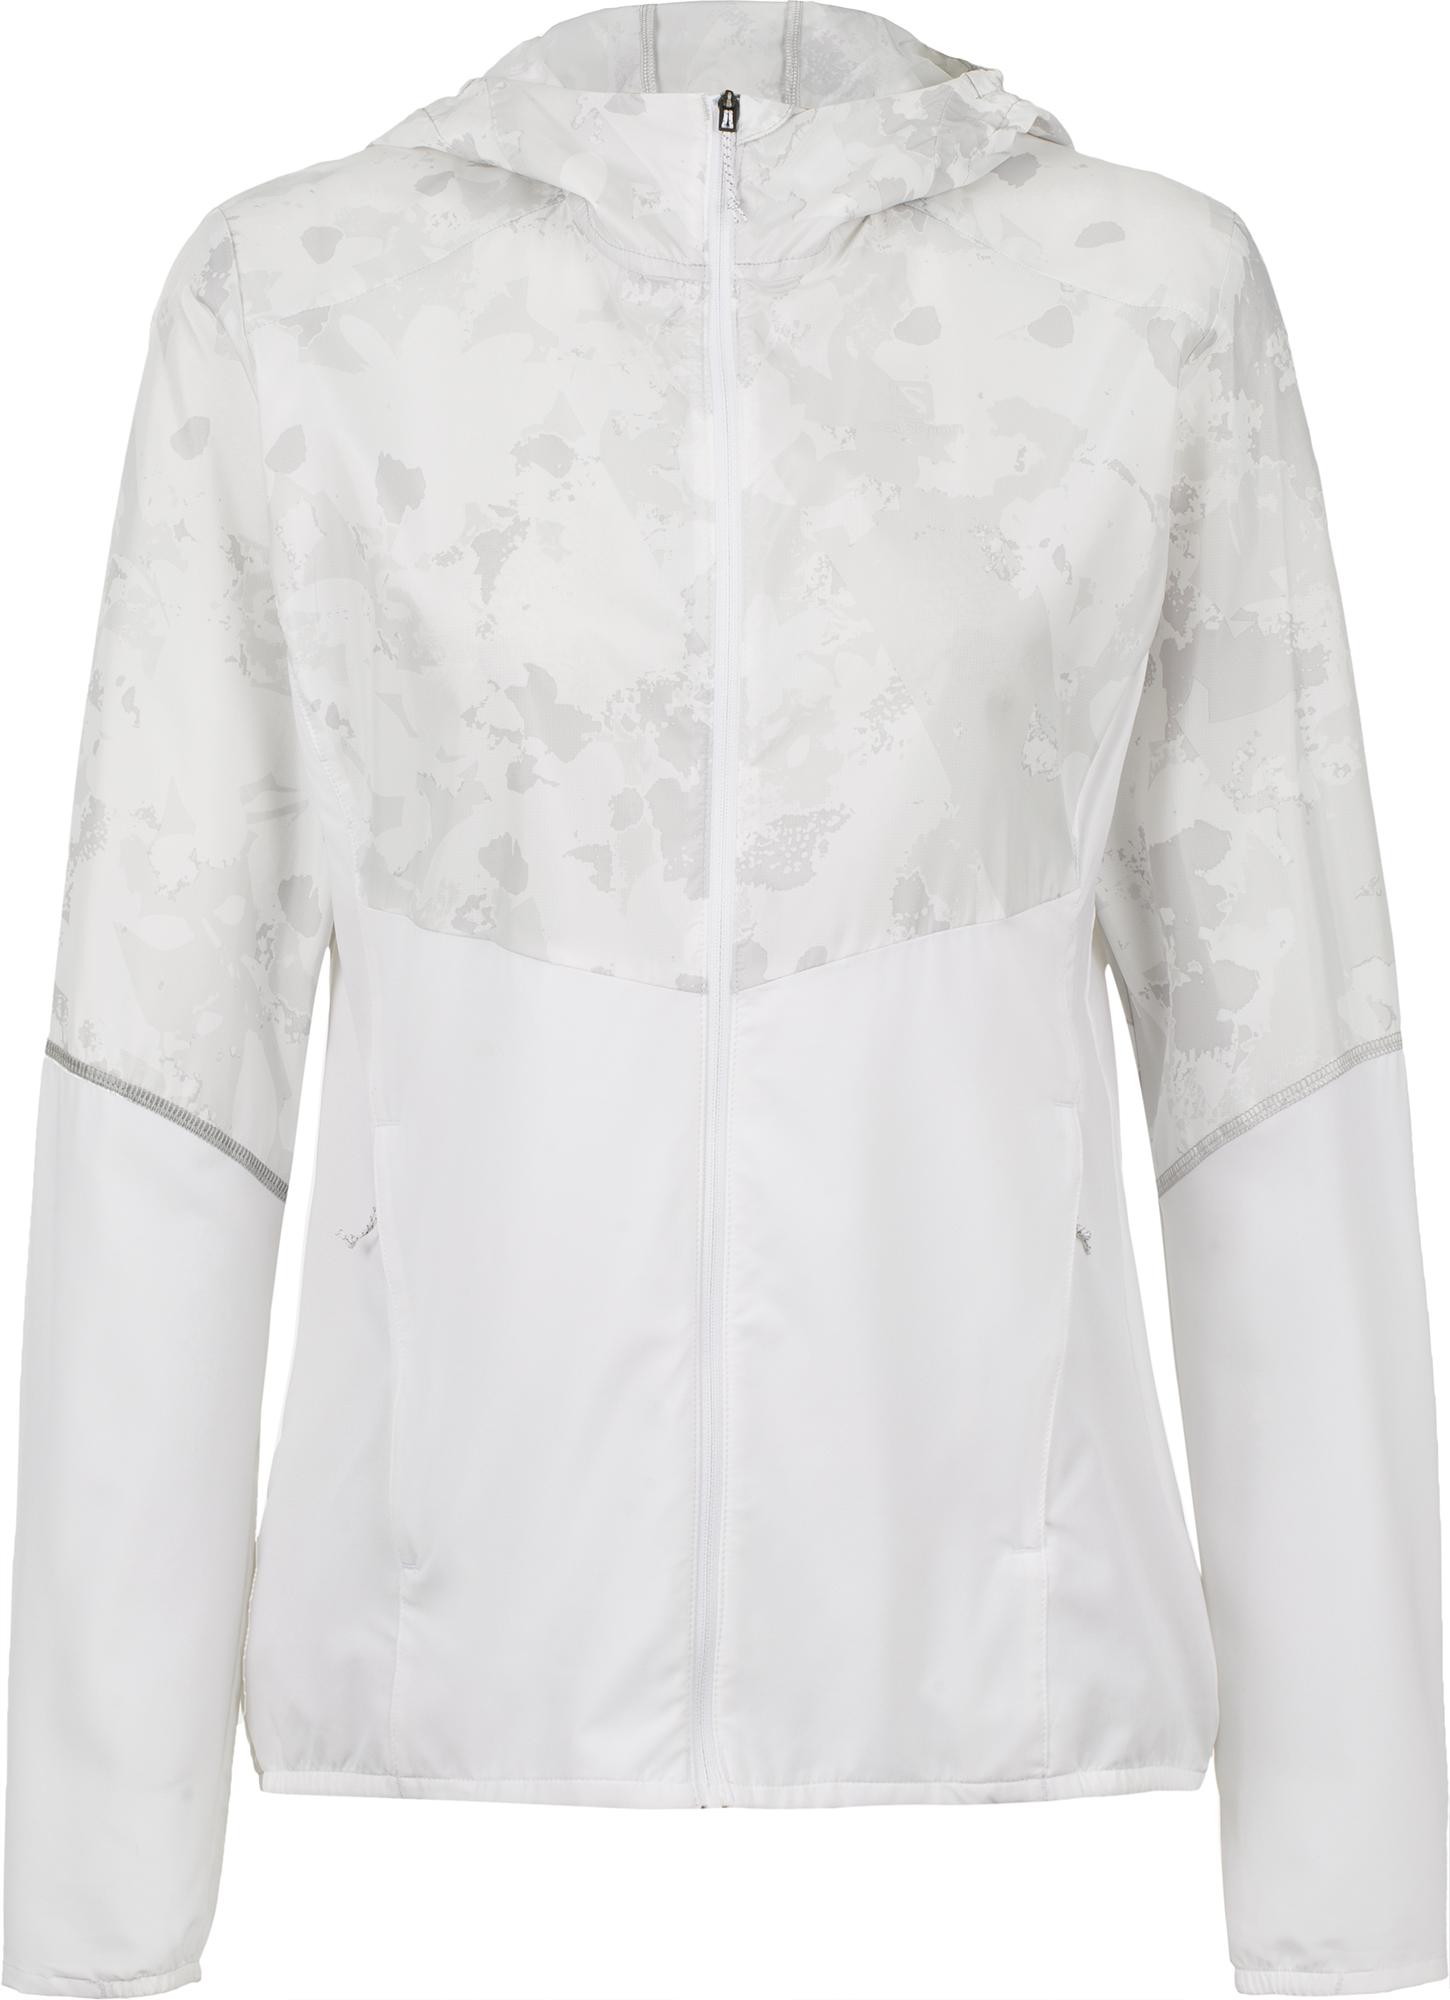 Salomon Куртка женская Salomon Agile, размер 46-48